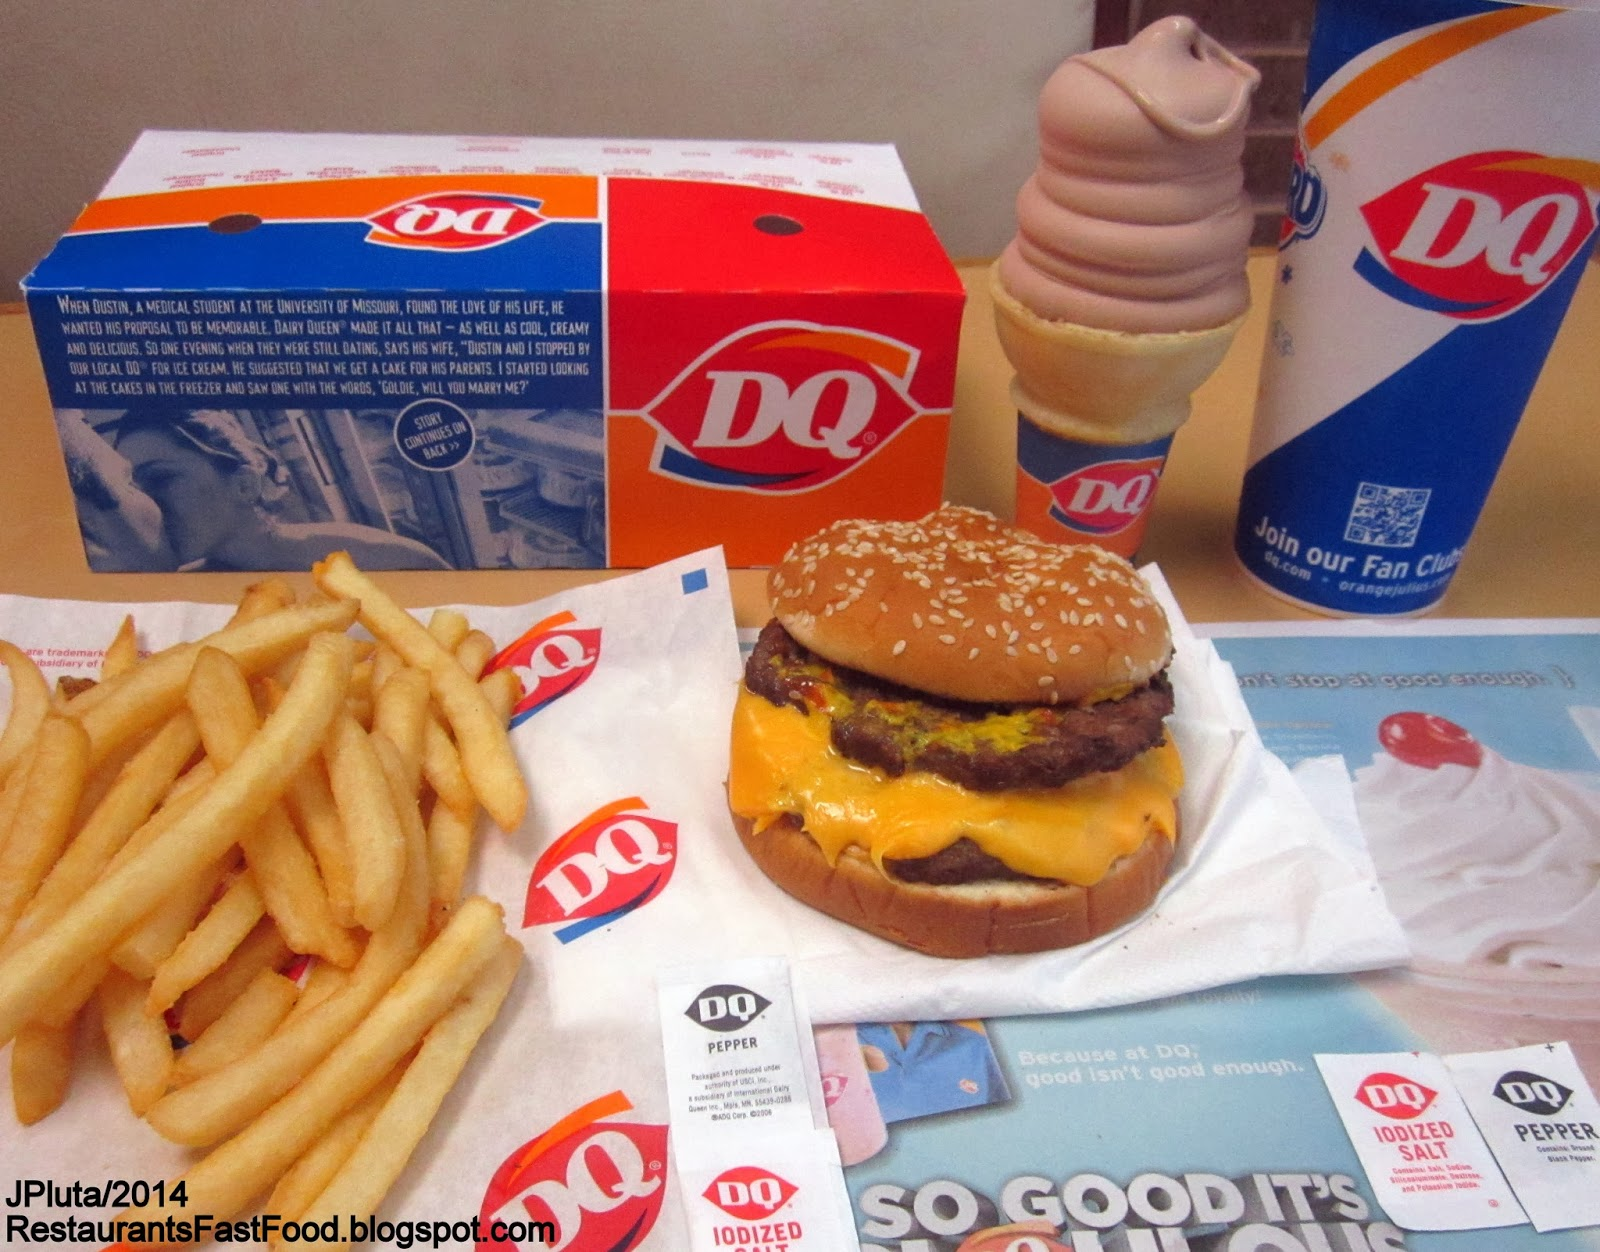 Fast Food Restaurants That Serve Hot Dogs